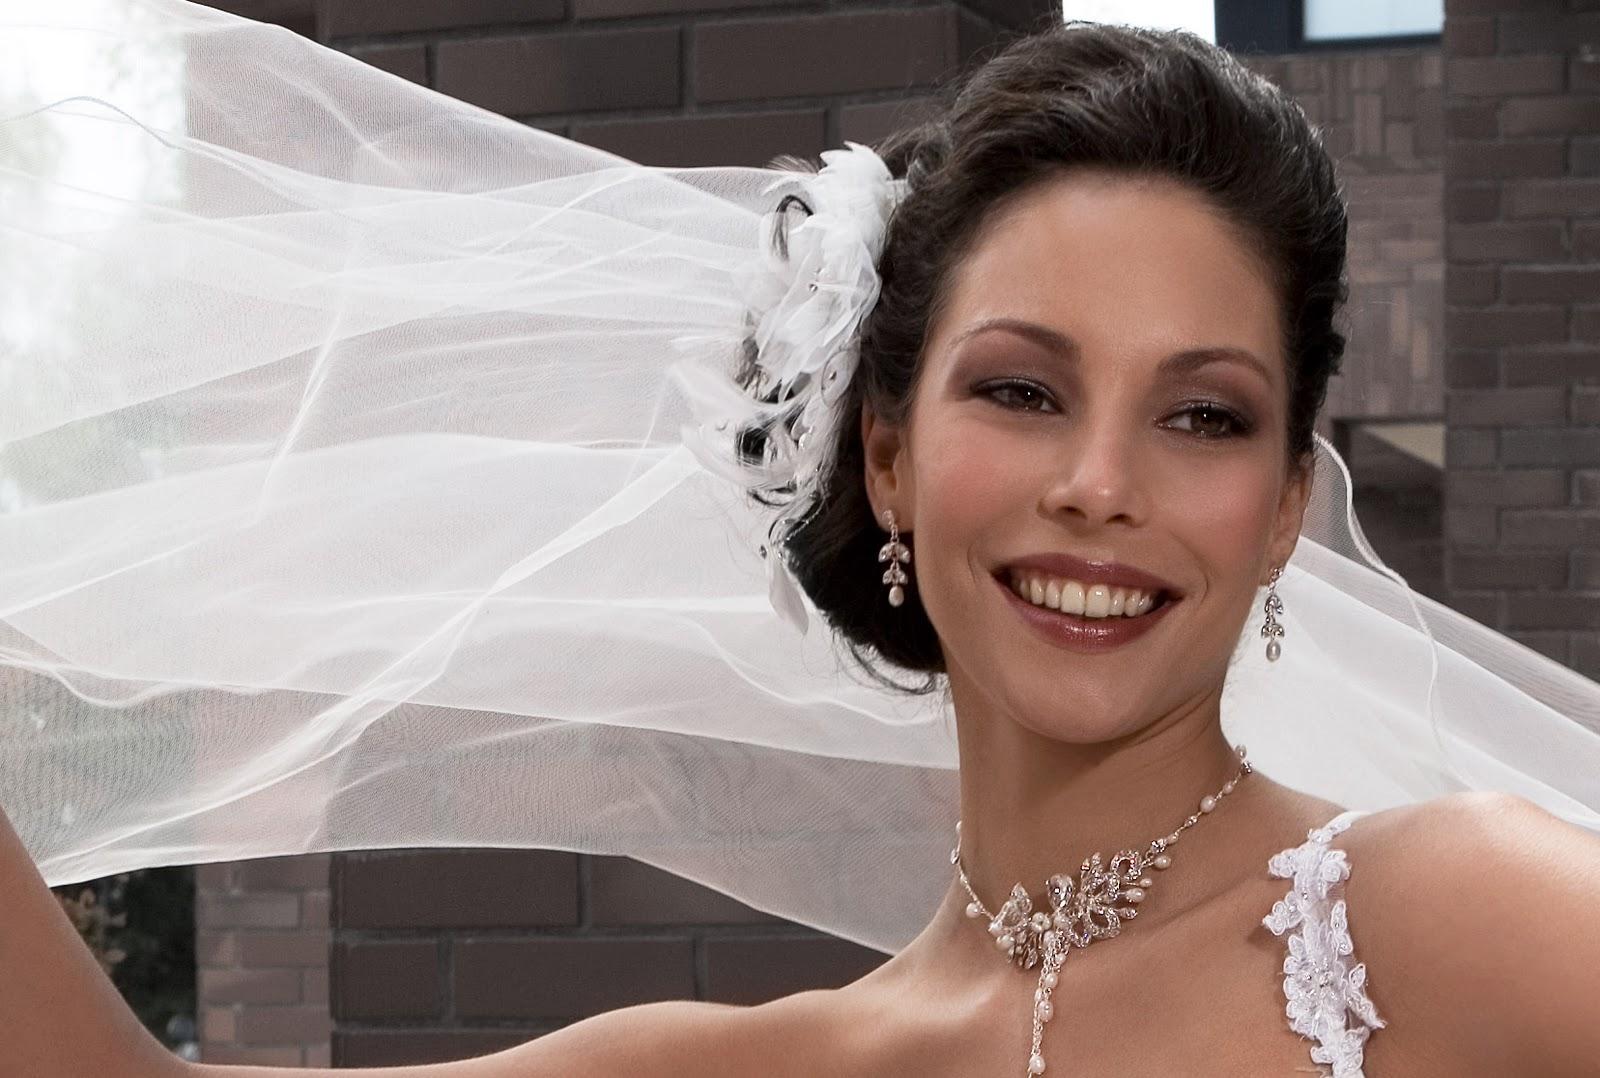 Make-Up Magazine: Wedding Day Makeup Tips And Advice